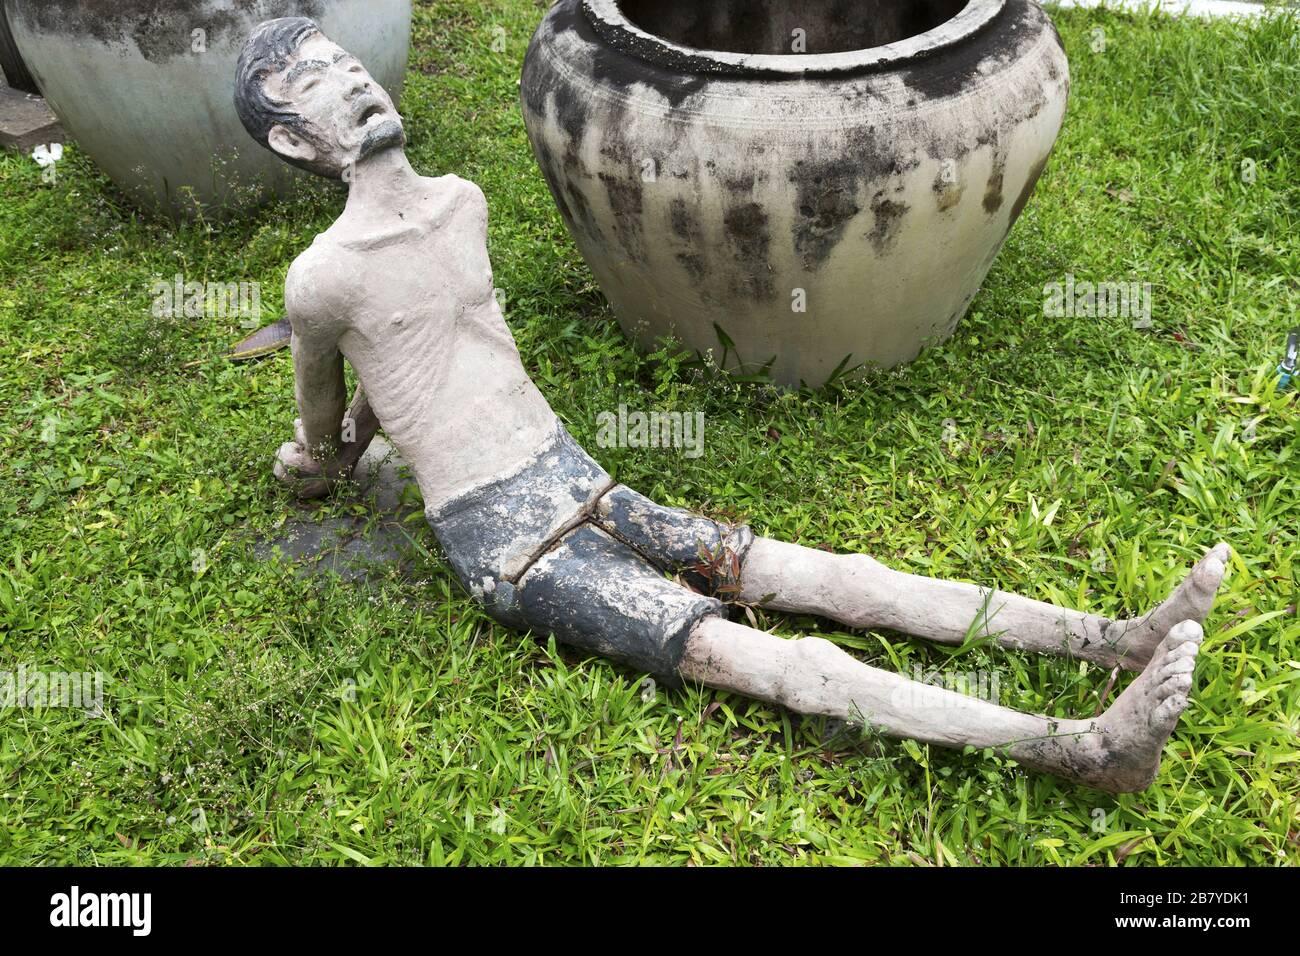 figure-of-tortured-prisoner-lying-on-gra